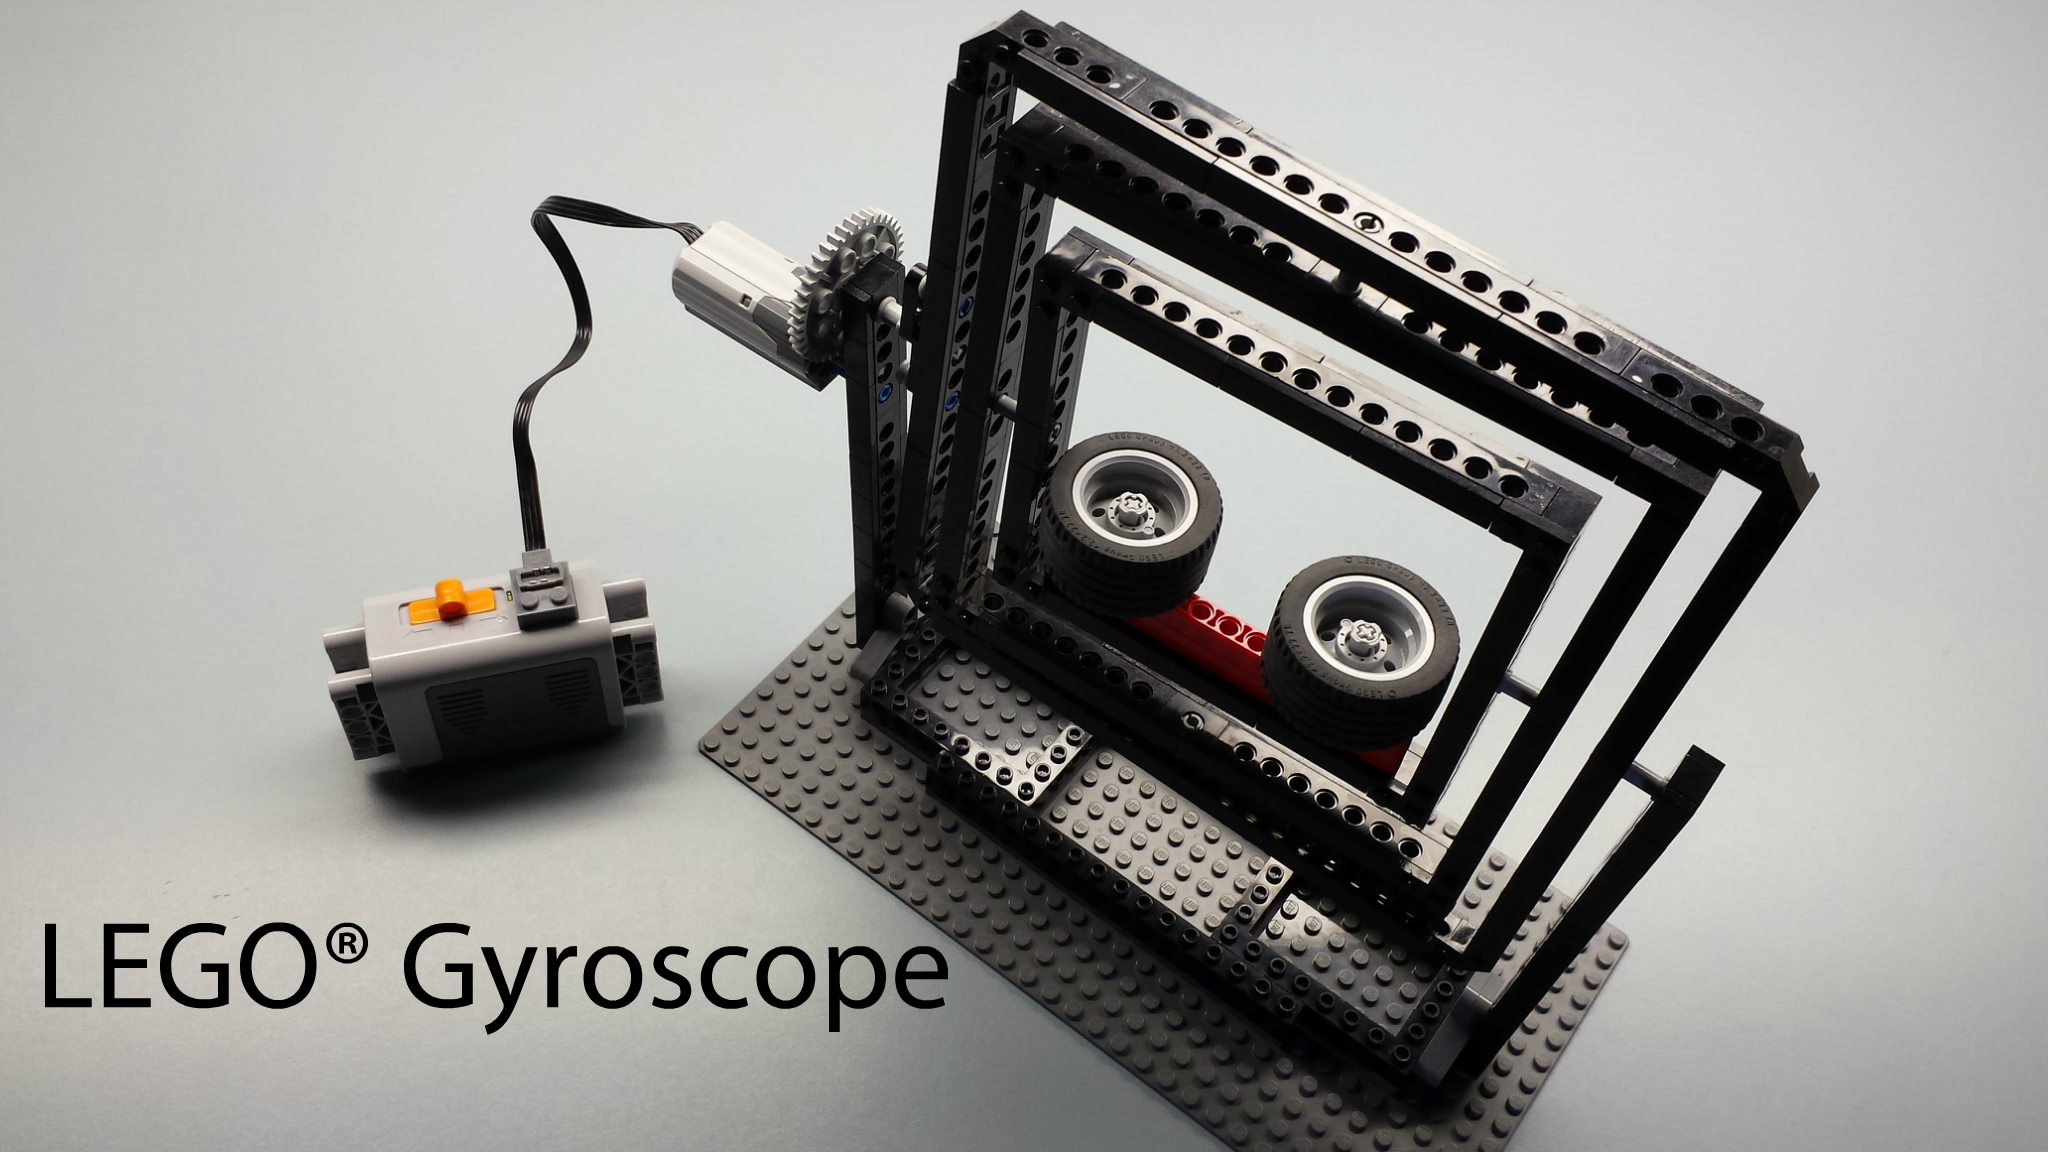 Beam 13 hole 14 pin BLACK 32018 LEGO Technic 4 x EXTRA LONG 1 x 14 Brick